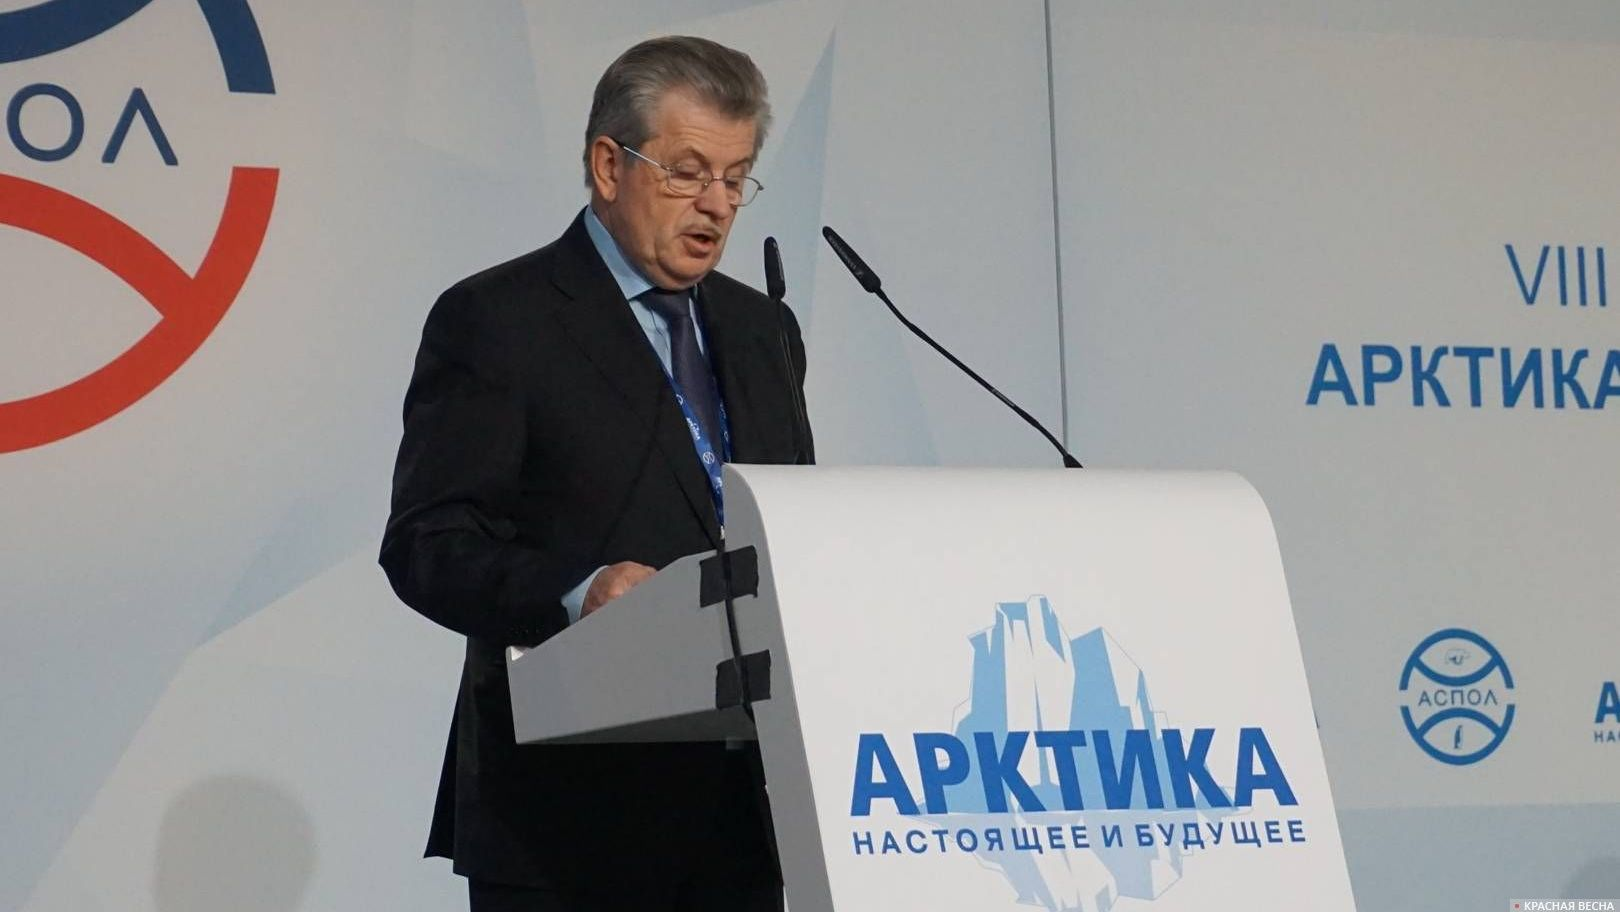 Сергей Вахруков. Санкт-Петербург. 05.12.2018